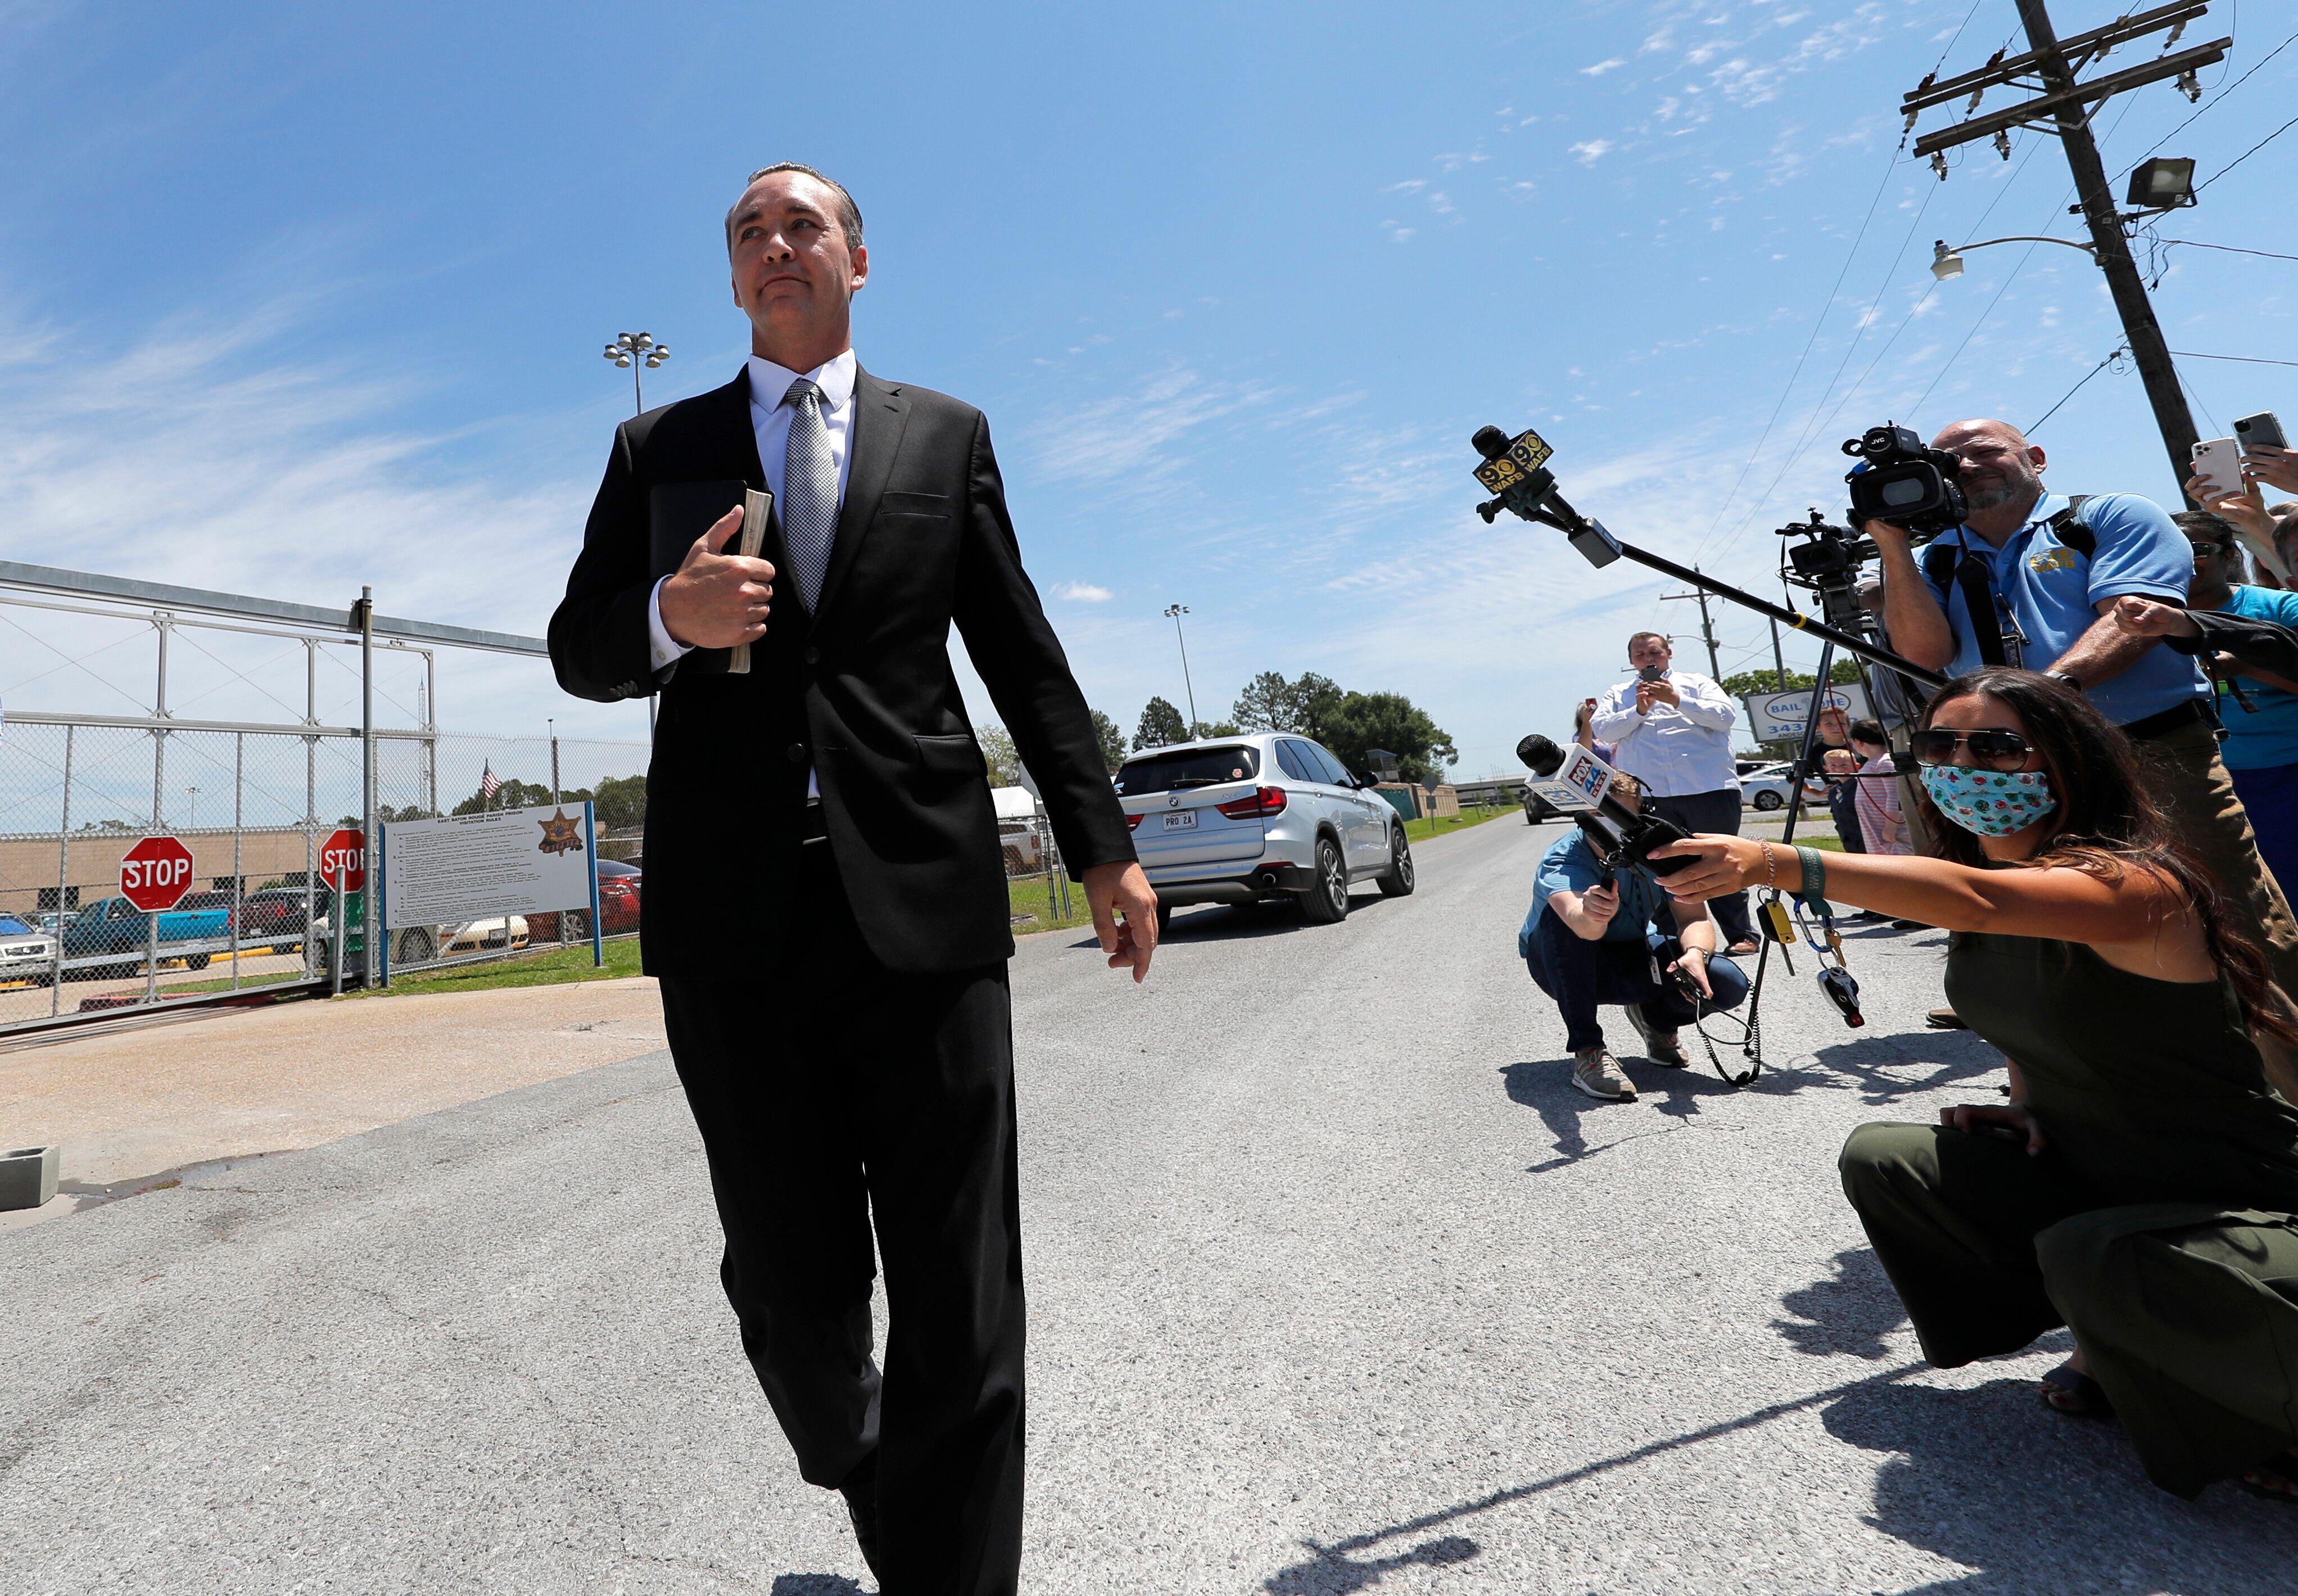 Spell leaves East Baton Rouge Parish jail after posting bond.